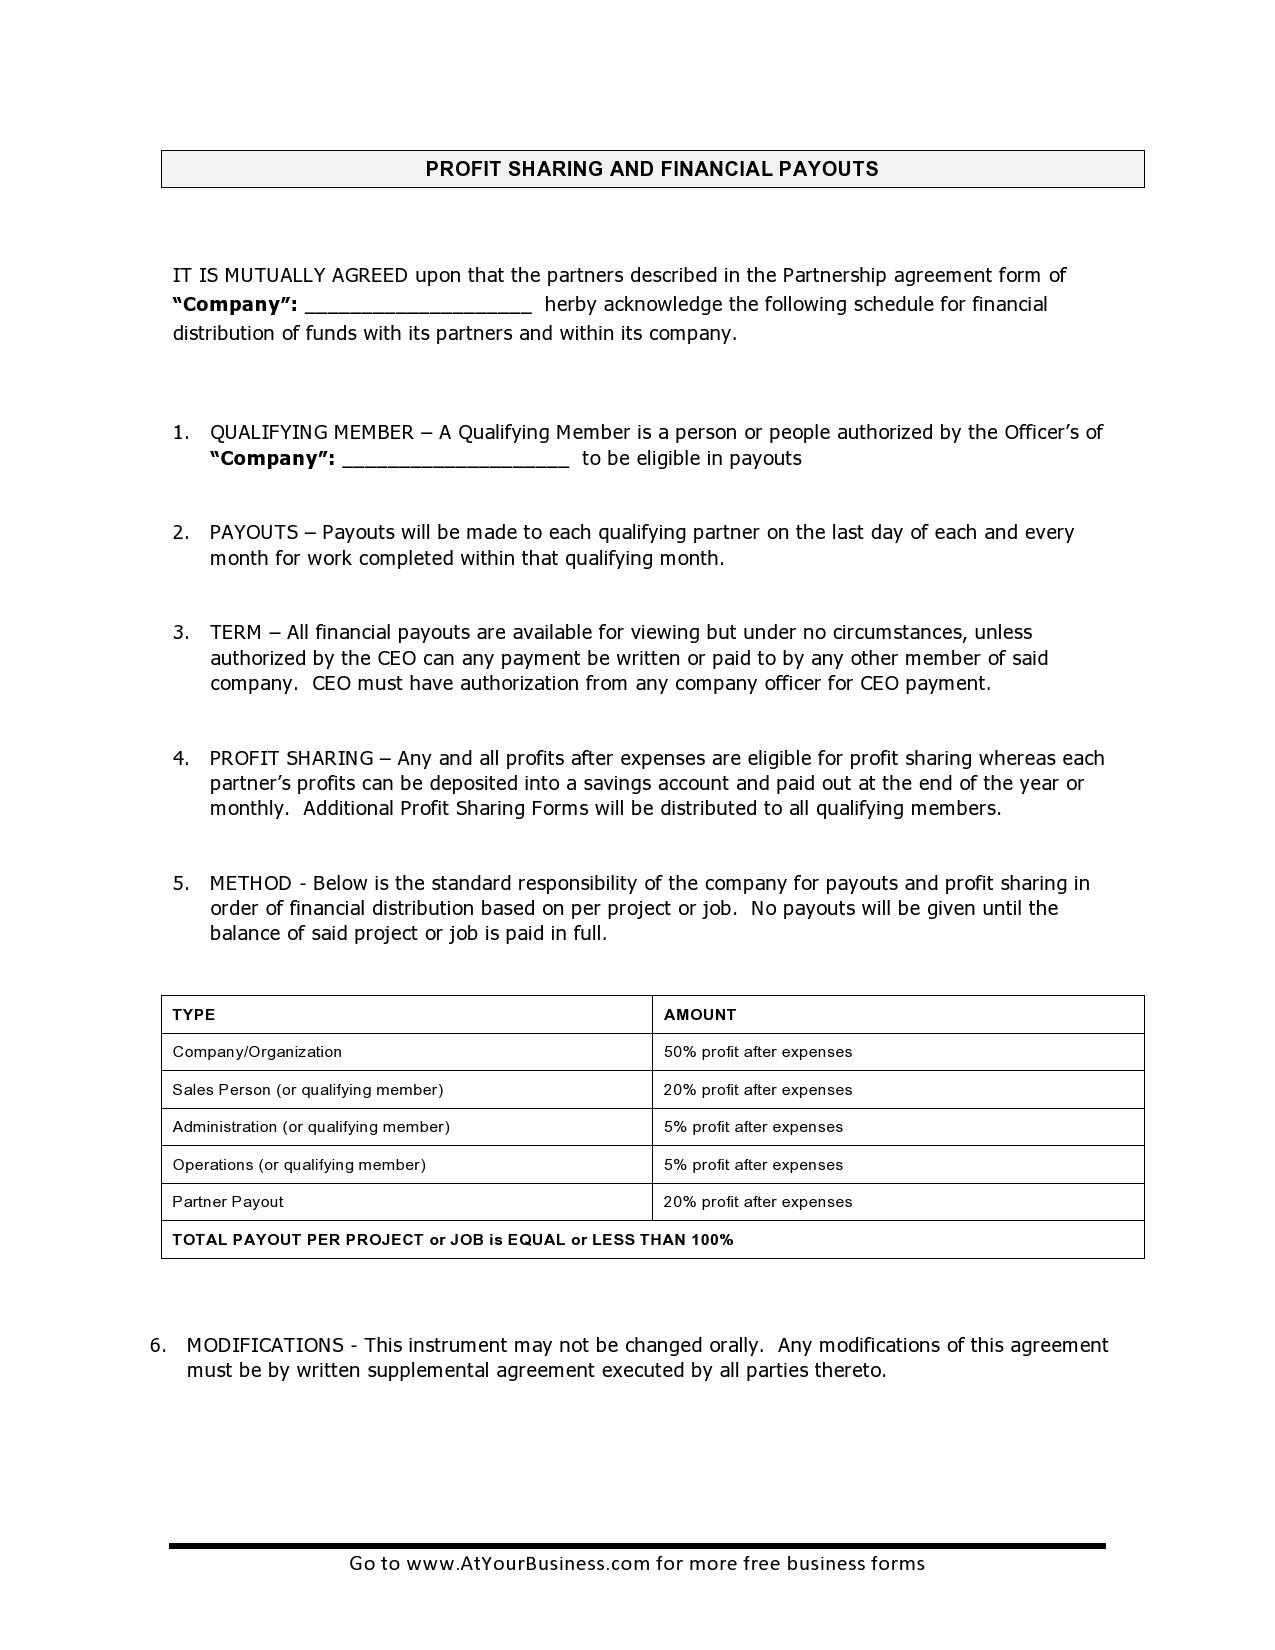 Free profit sharing agreement 16